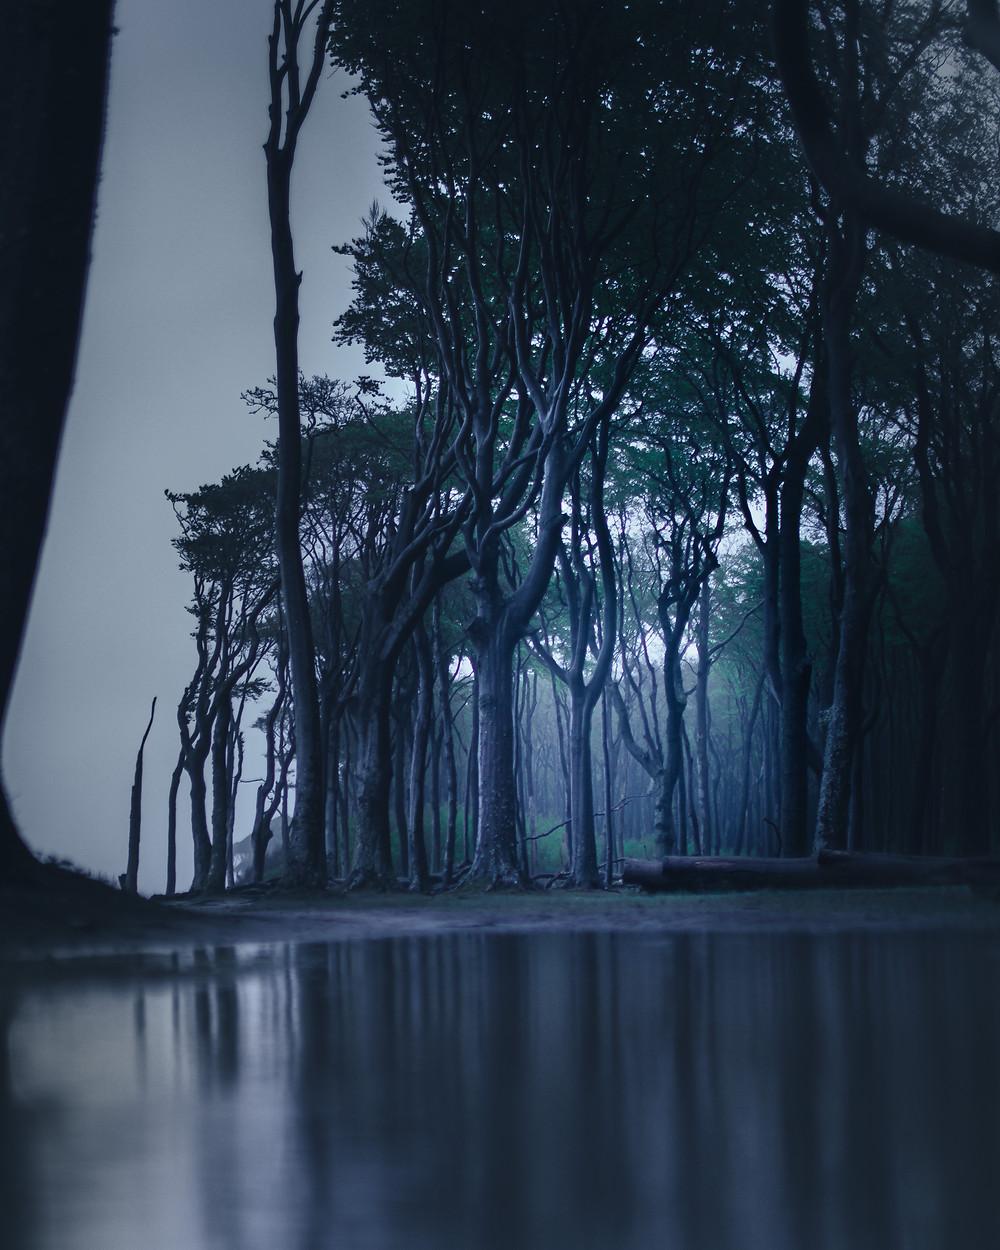 Dark, moody forest